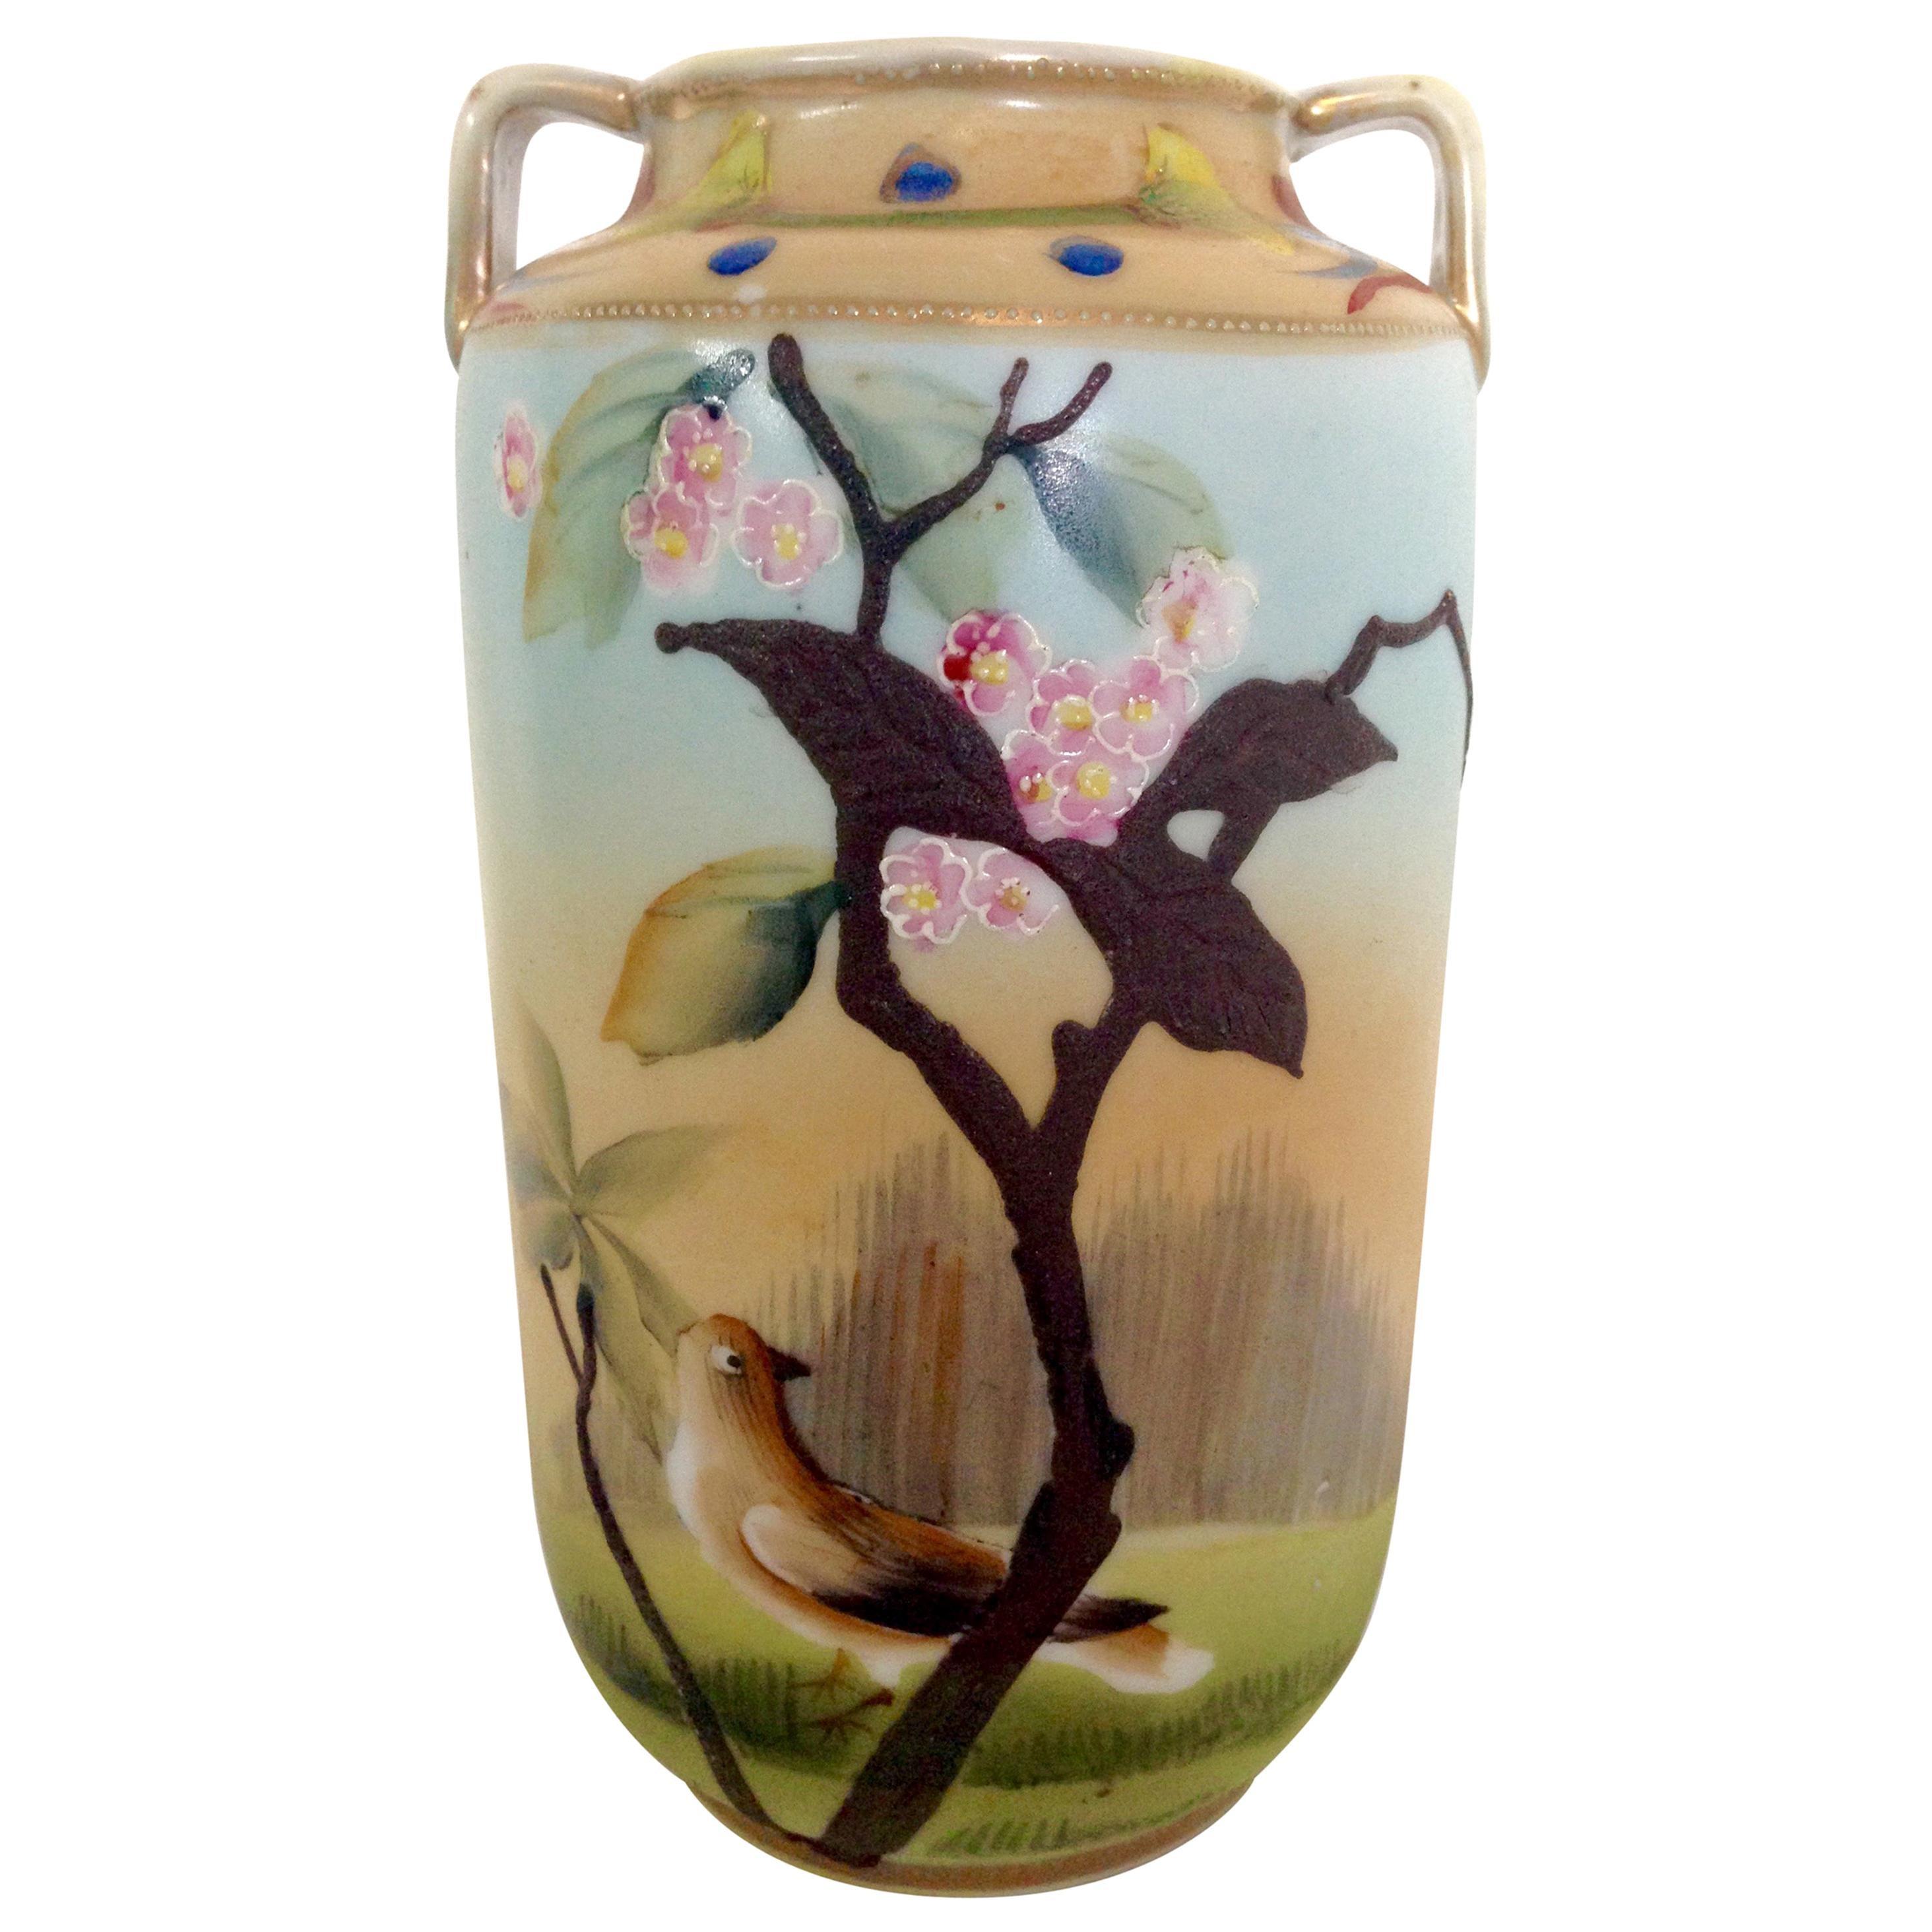 Antique Japanese Porcelain Hand Painted Bird Motif Vase